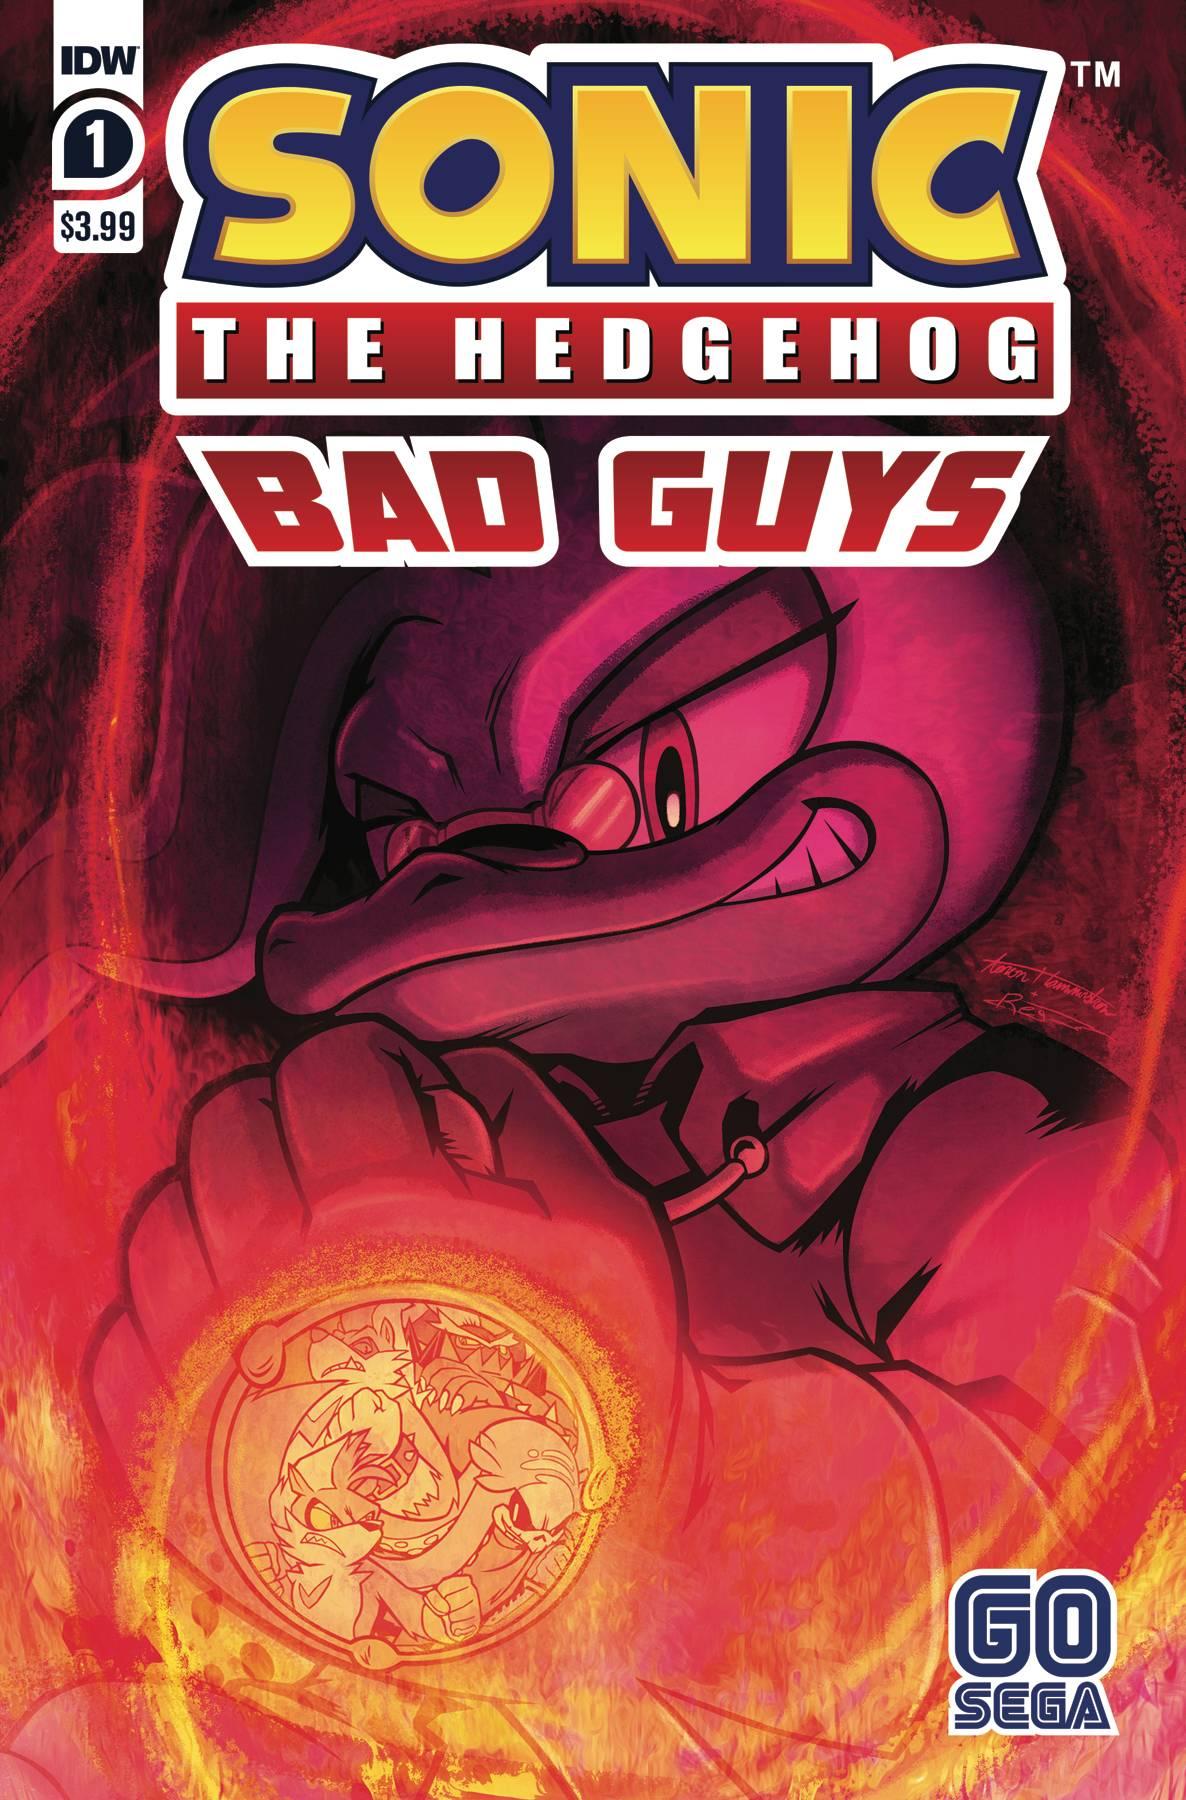 Sonic The Hedgehog: Bad Guys #1 (2020)